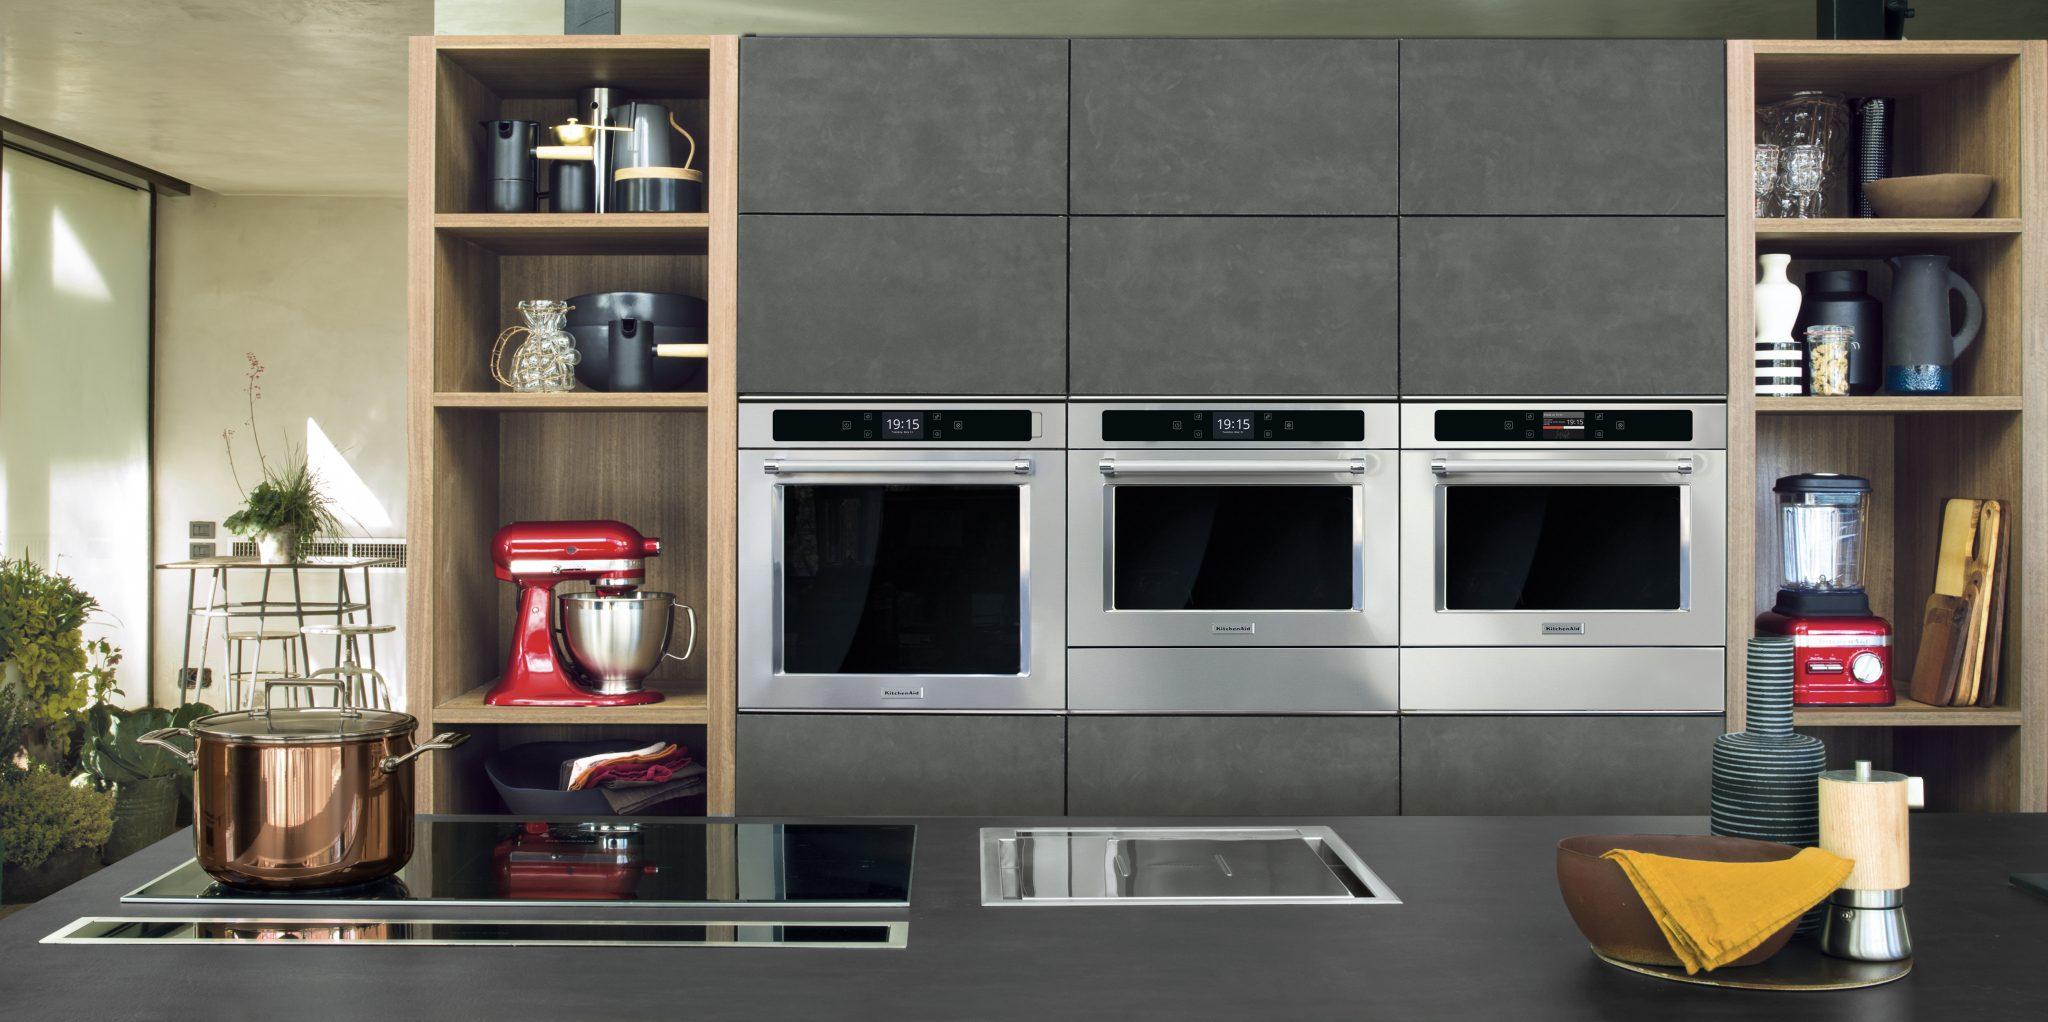 Twelix 4 Artisan: il nuovo forno KitchenAid